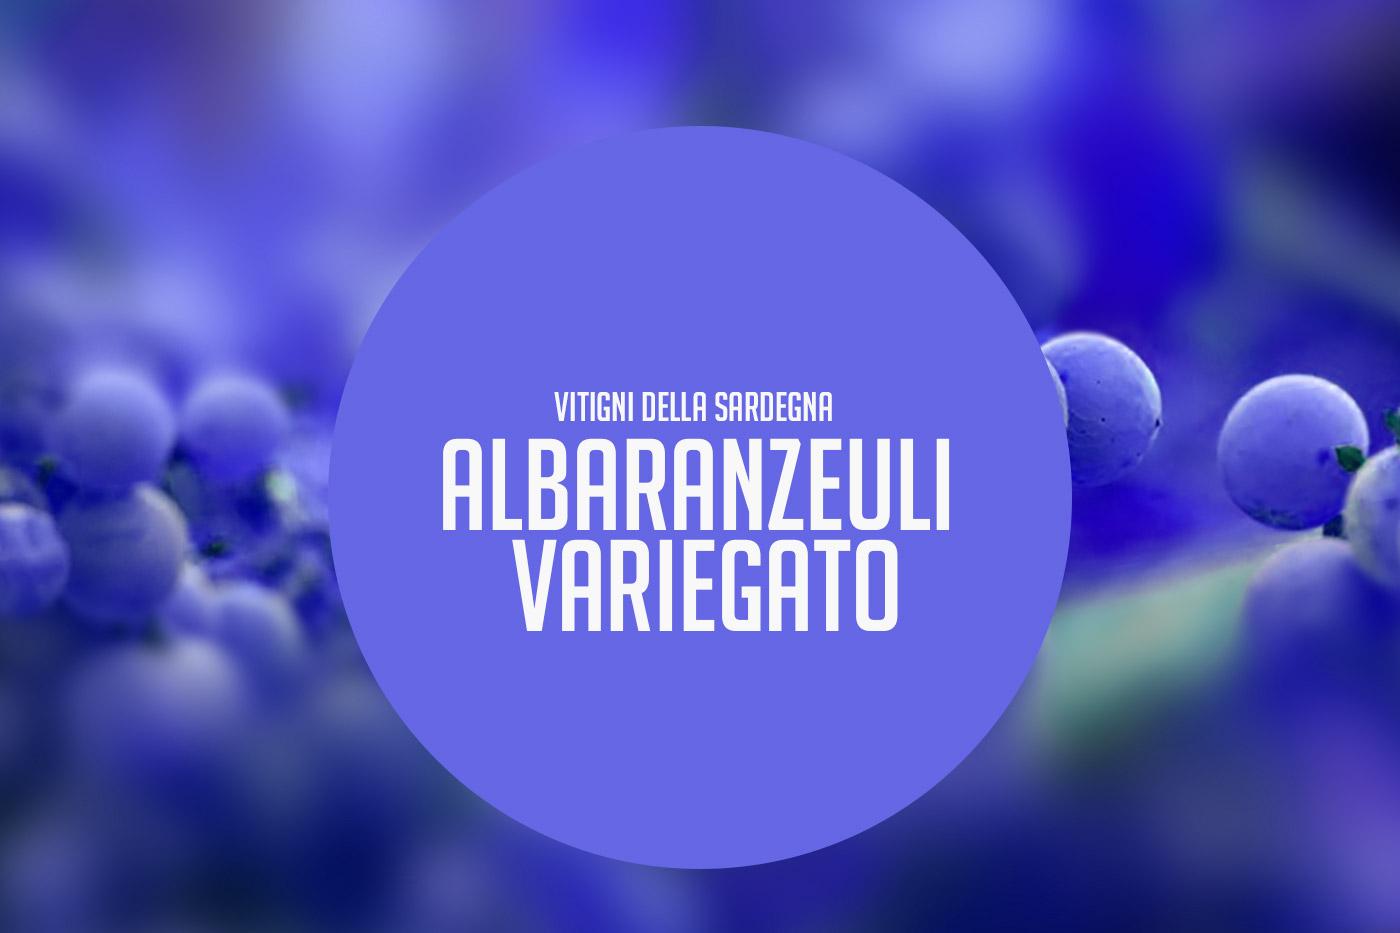 Albaranzeuli variegato